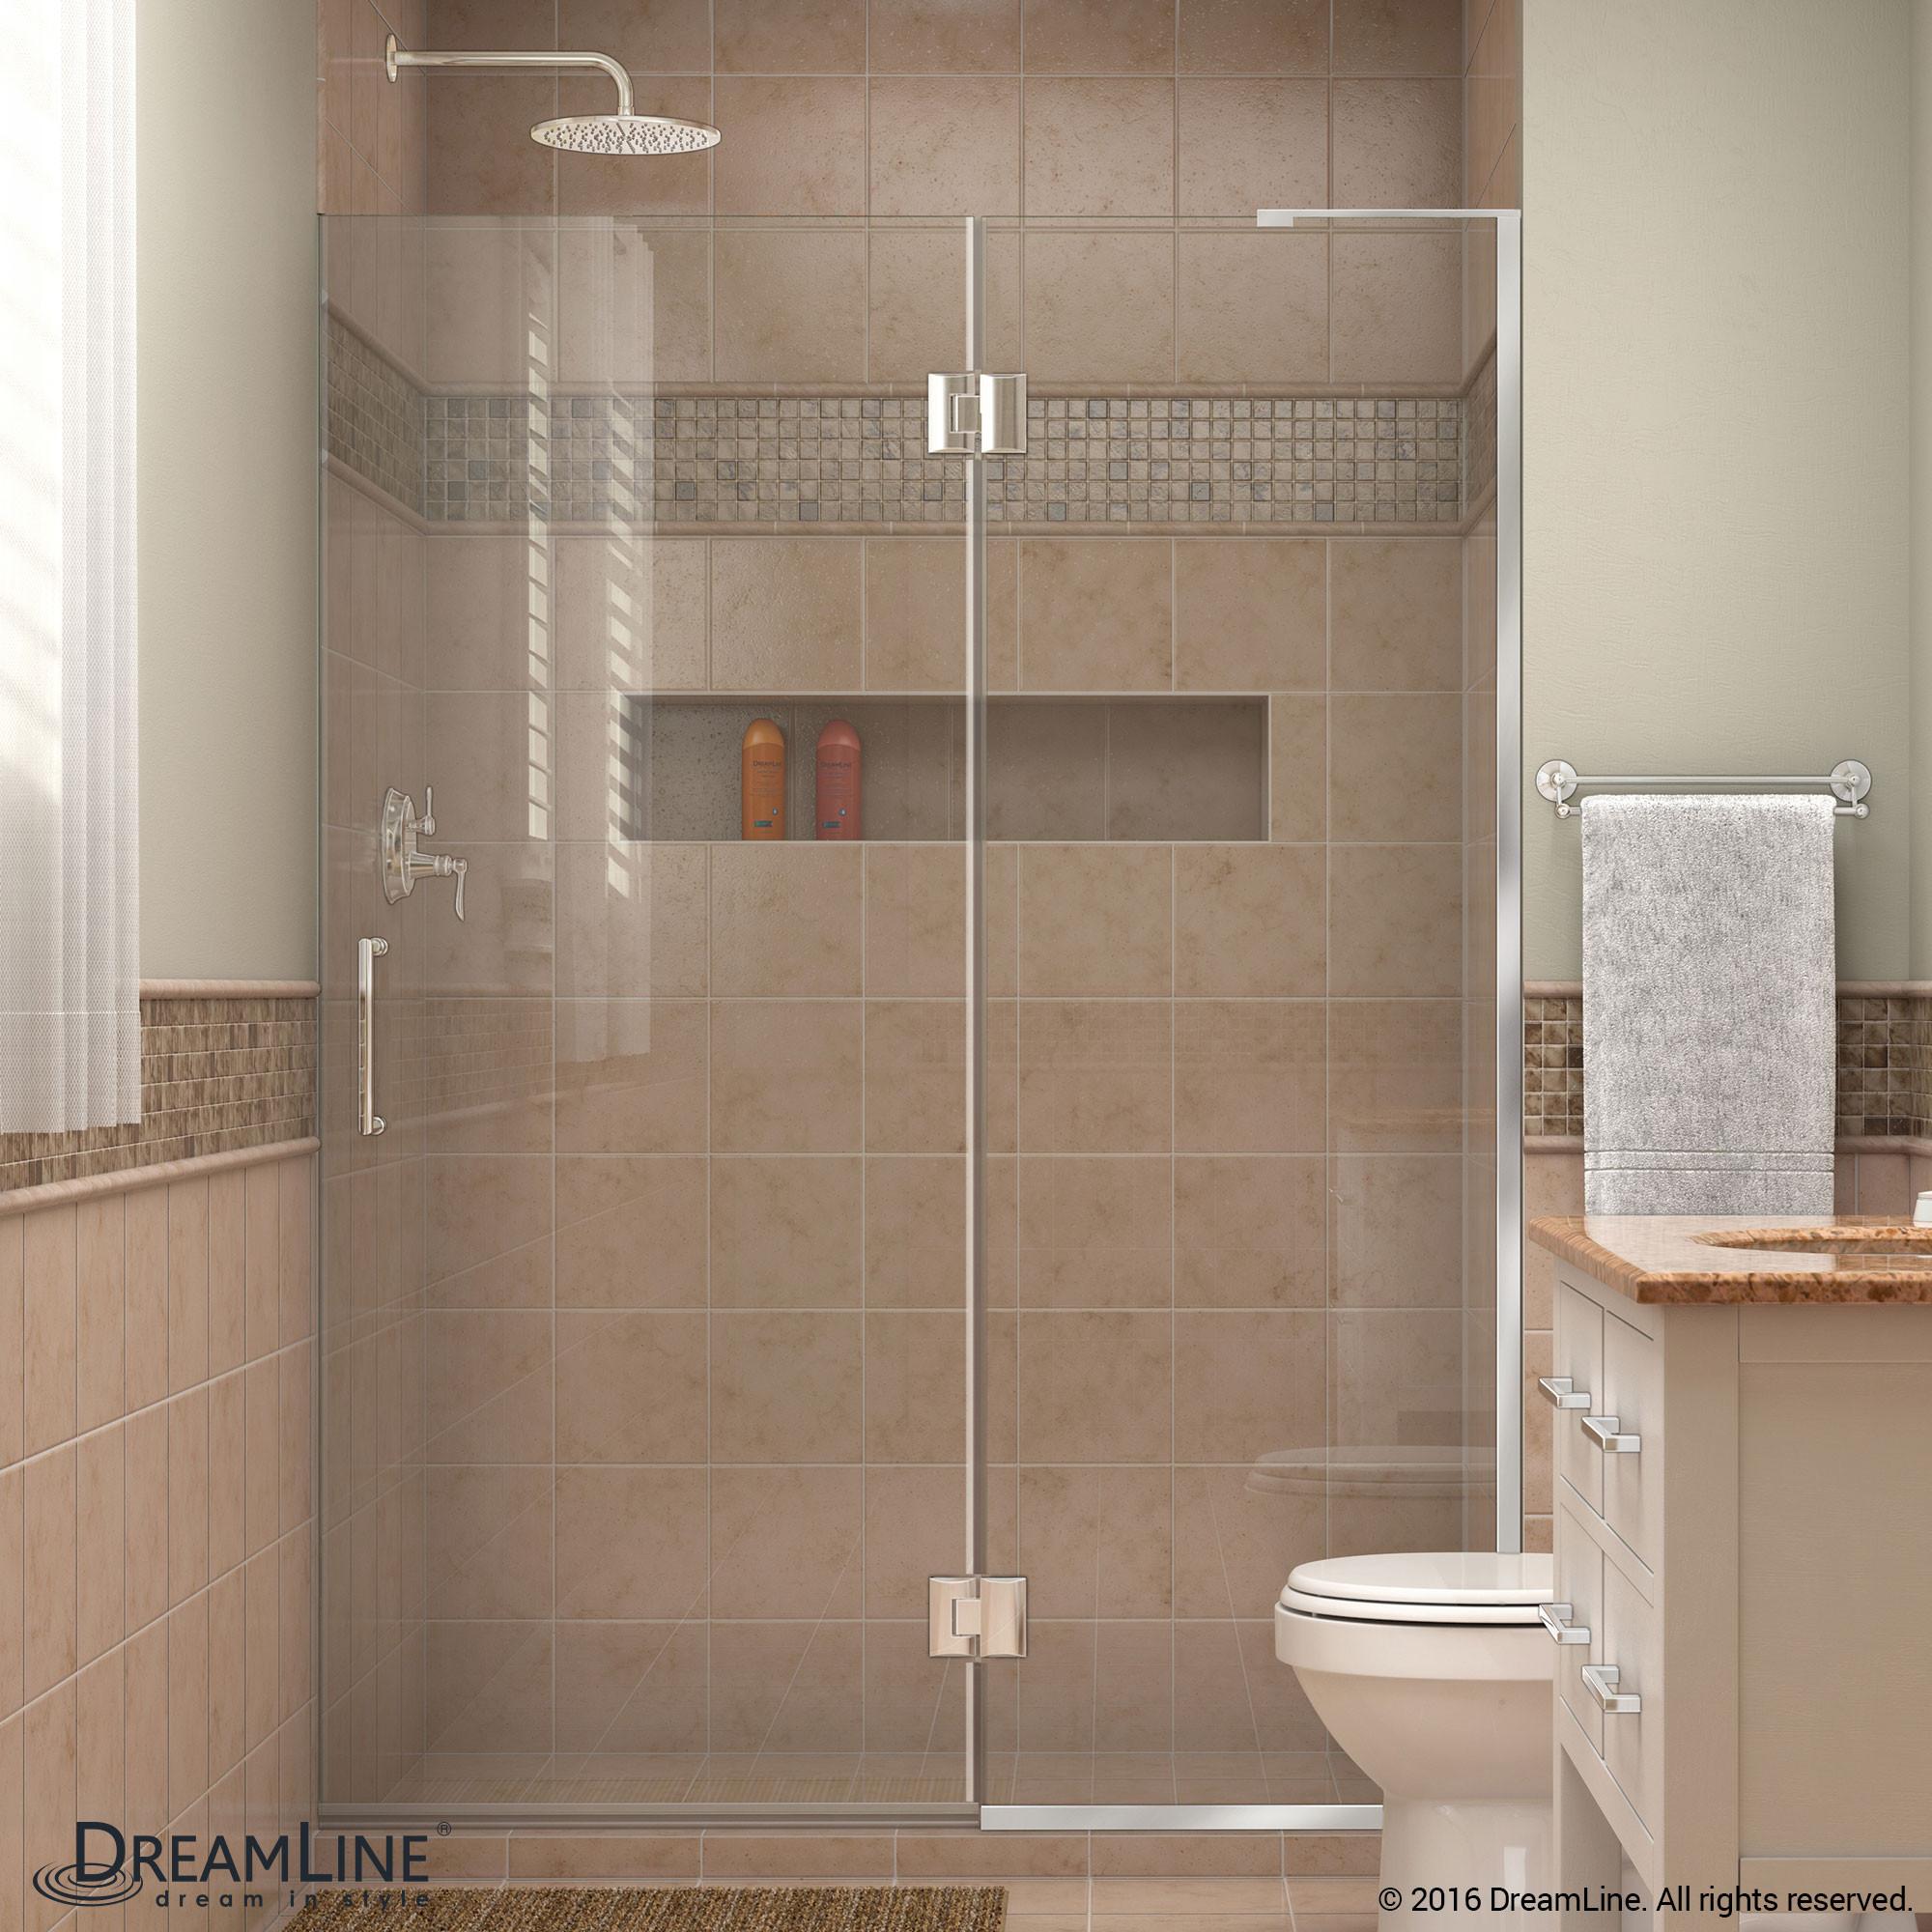 DreamLine D32372R-01 Chrome Unidoor-X Hinged Shower Door With Right-wall Bracket